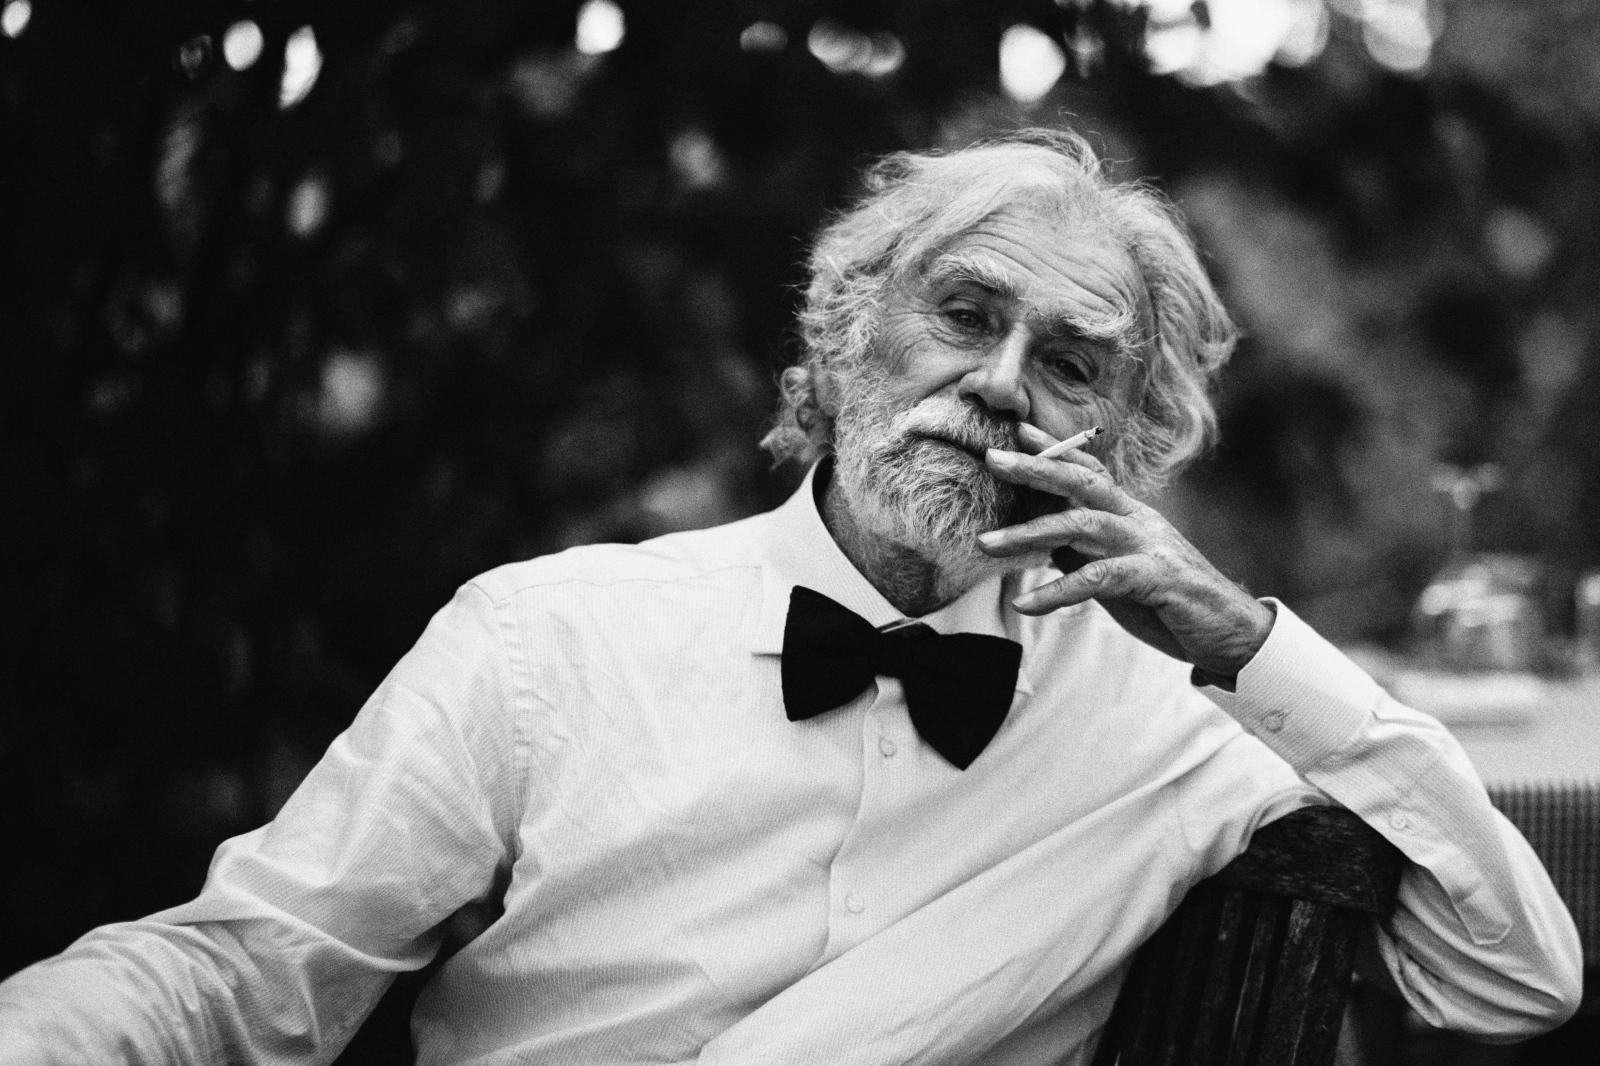 Black Monochrome Portrait Photography Smoking Gentleman Person Man Human Oldman Photograph Cigarette And White